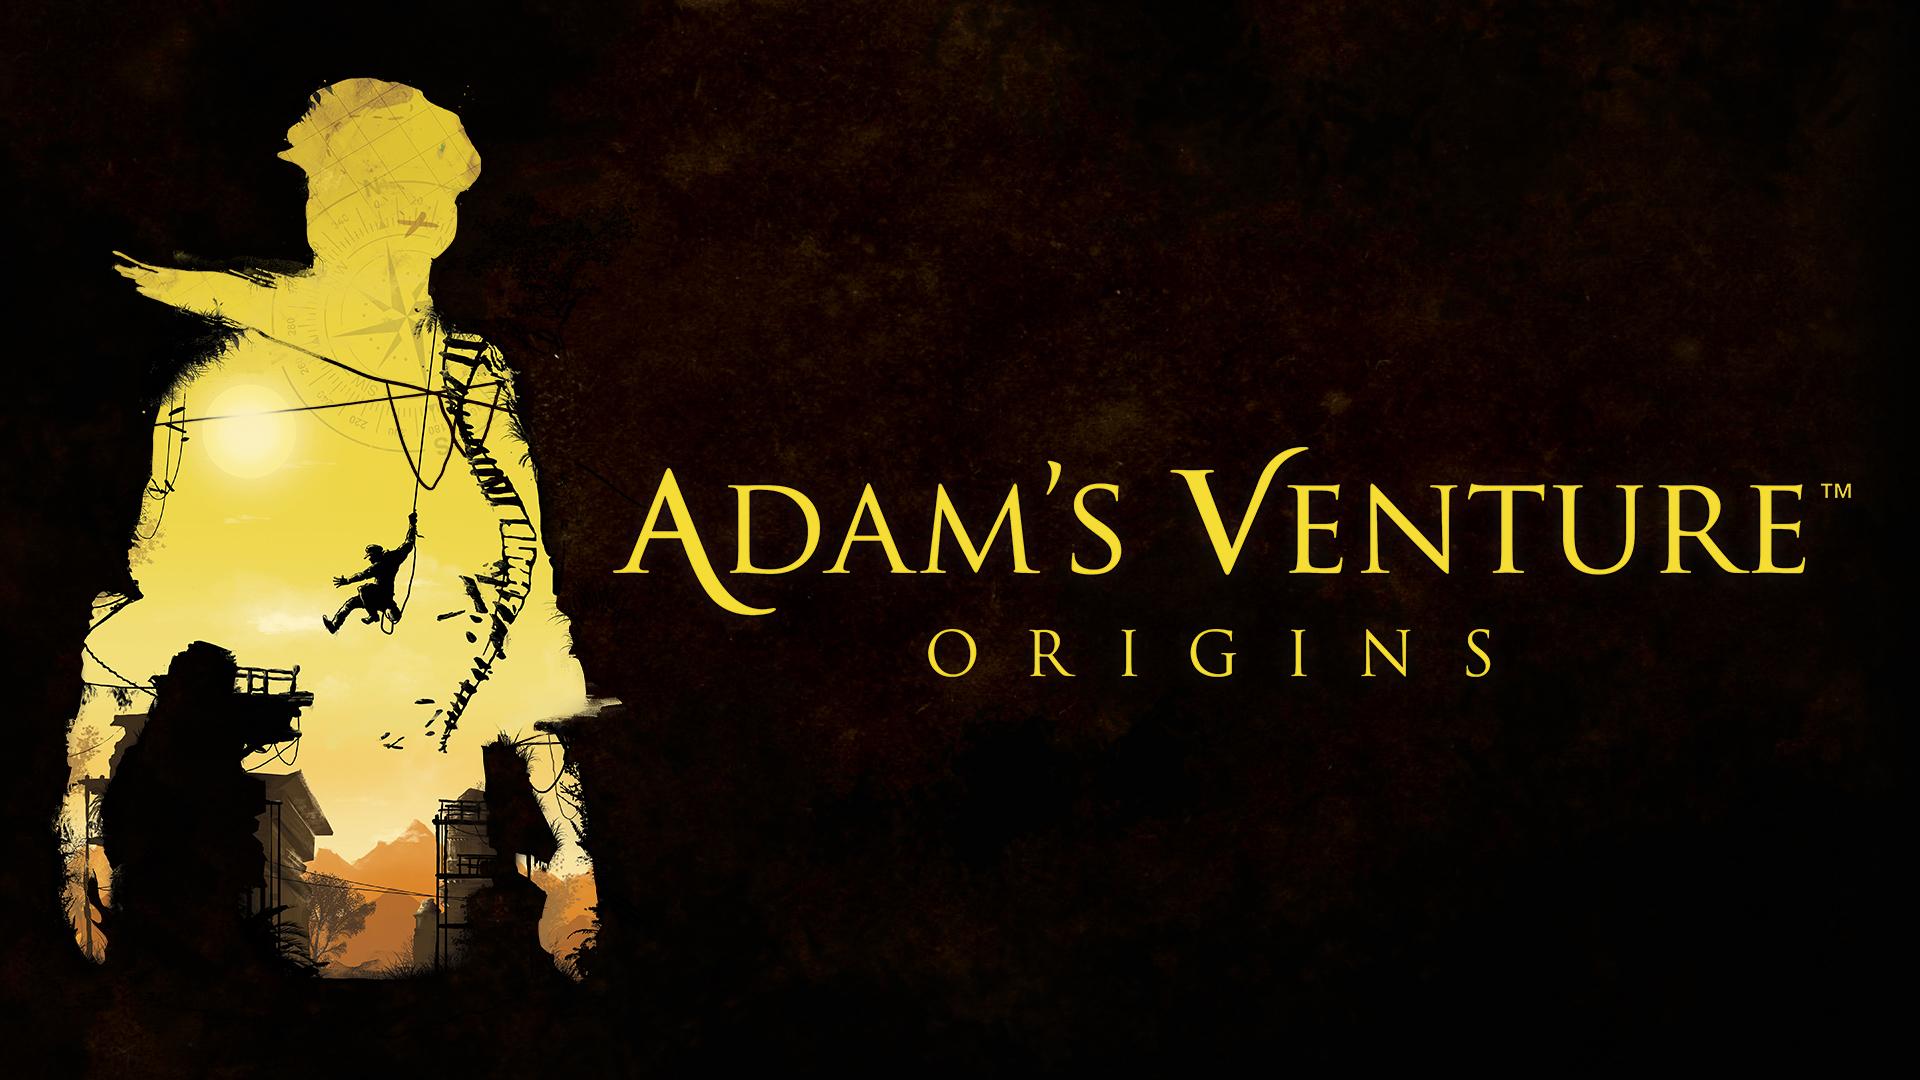 Adam's Venture : Originsdébarque sur Nintendo Switch le 29 mai prochain